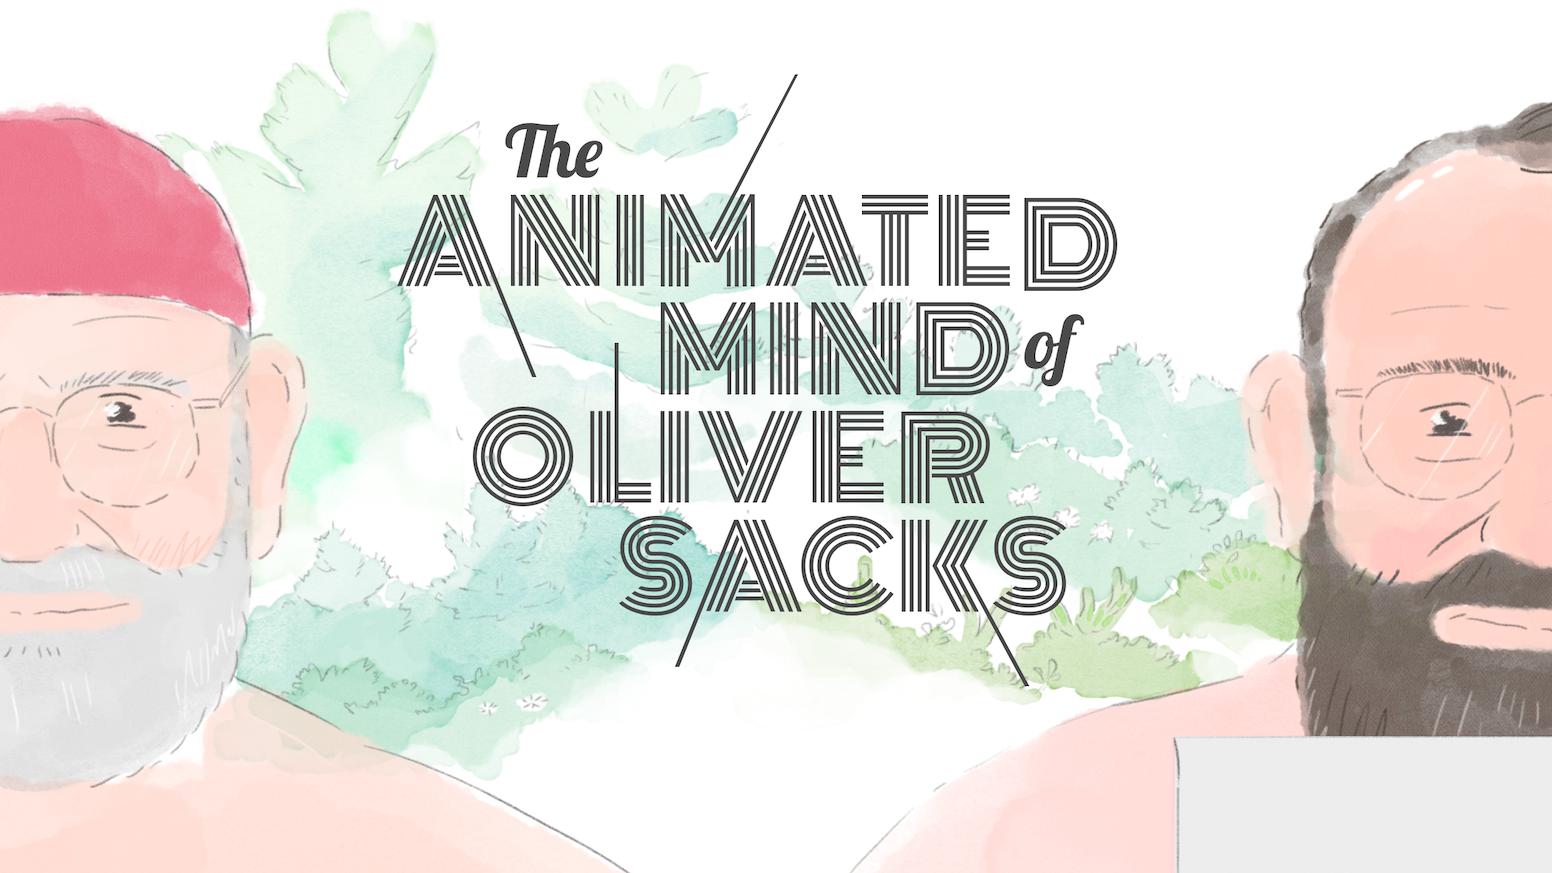 the animated mind of oliver sacks by dempsey rice kickstarter